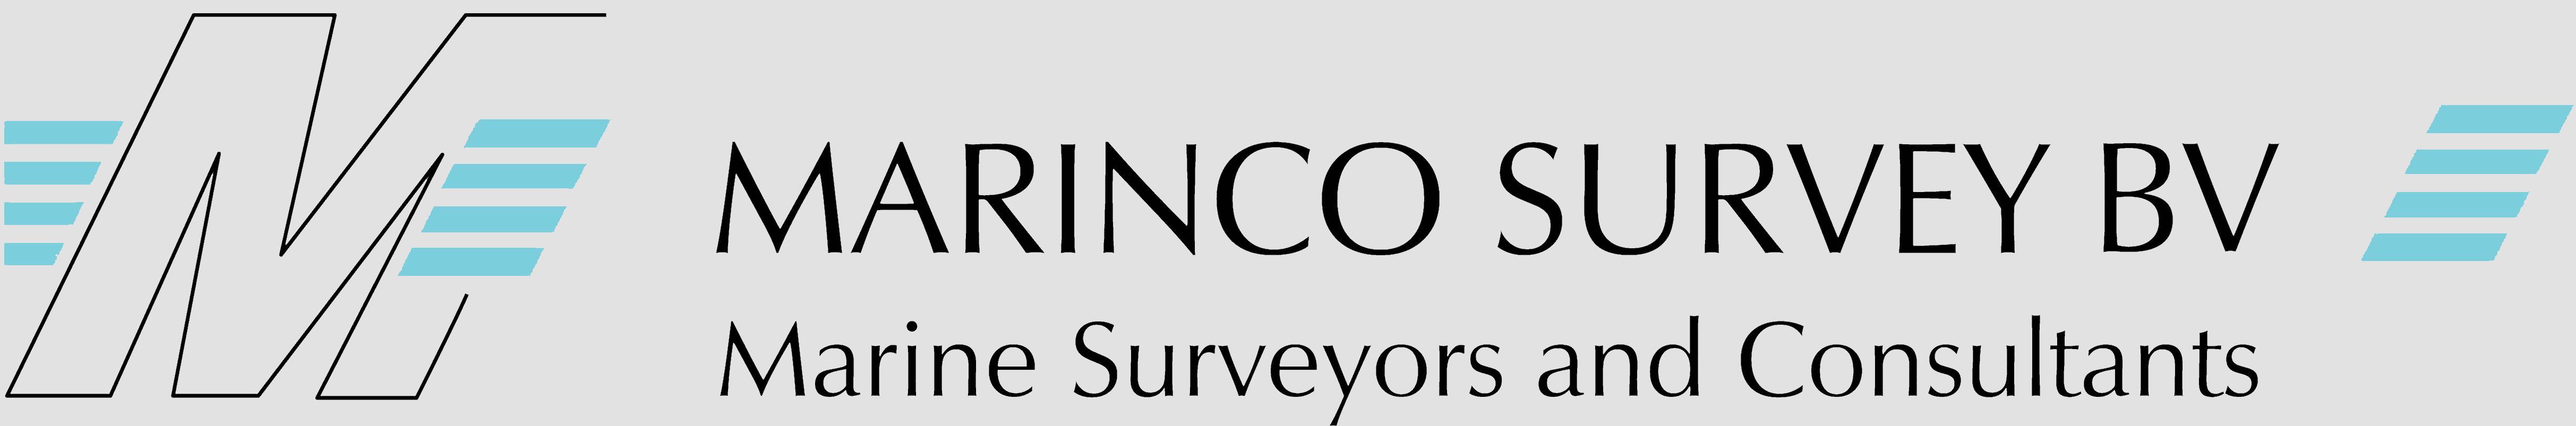 Marinco Survey